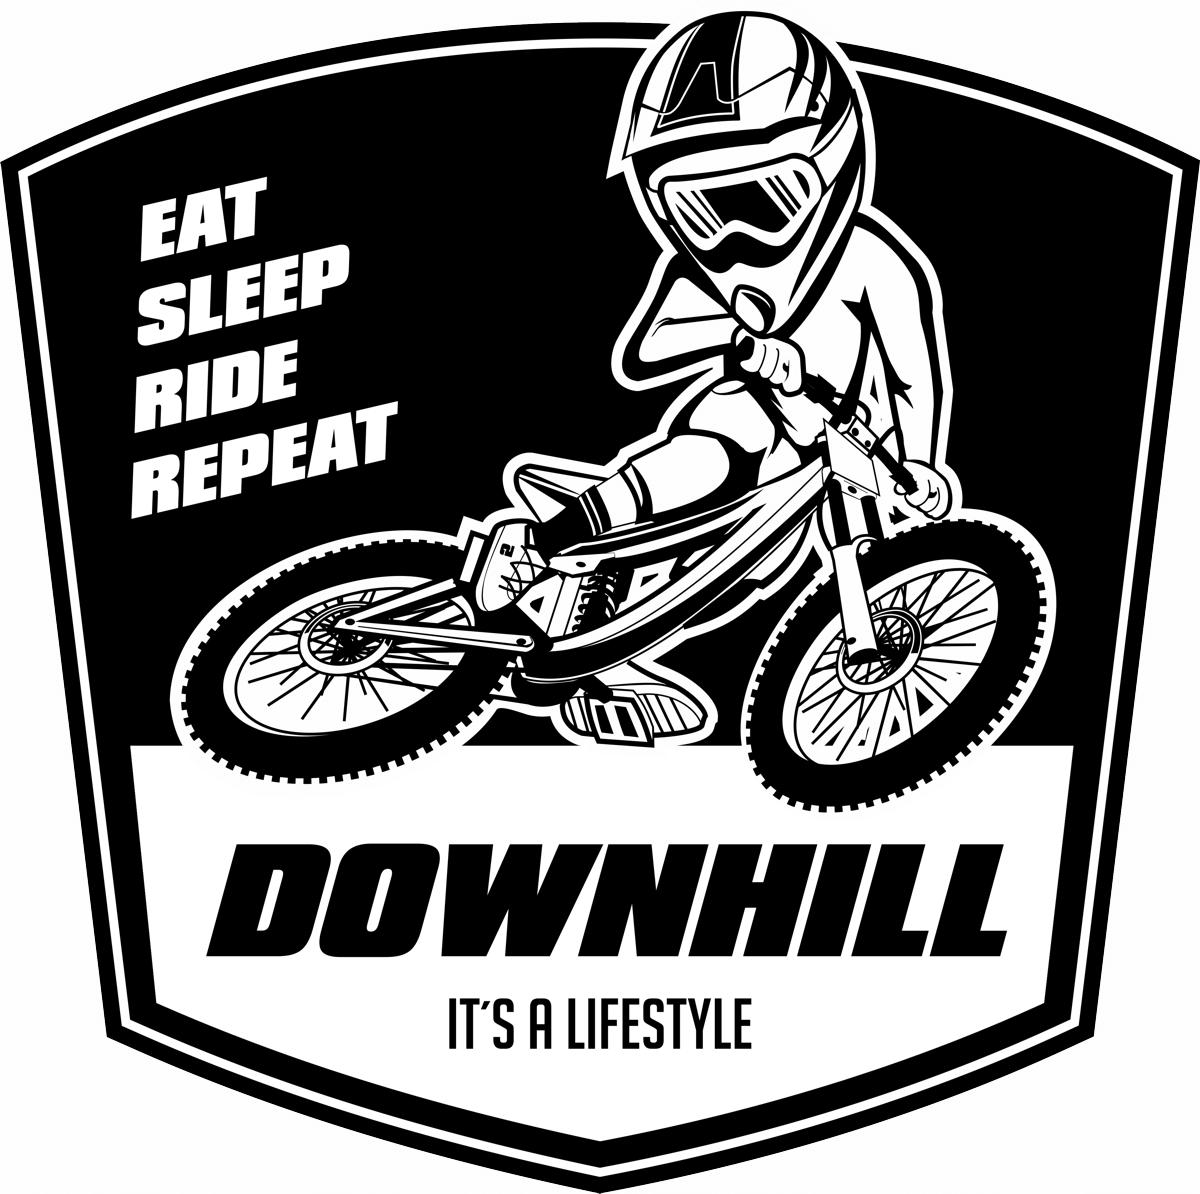 downhill-mtb-t-shirt-motiv